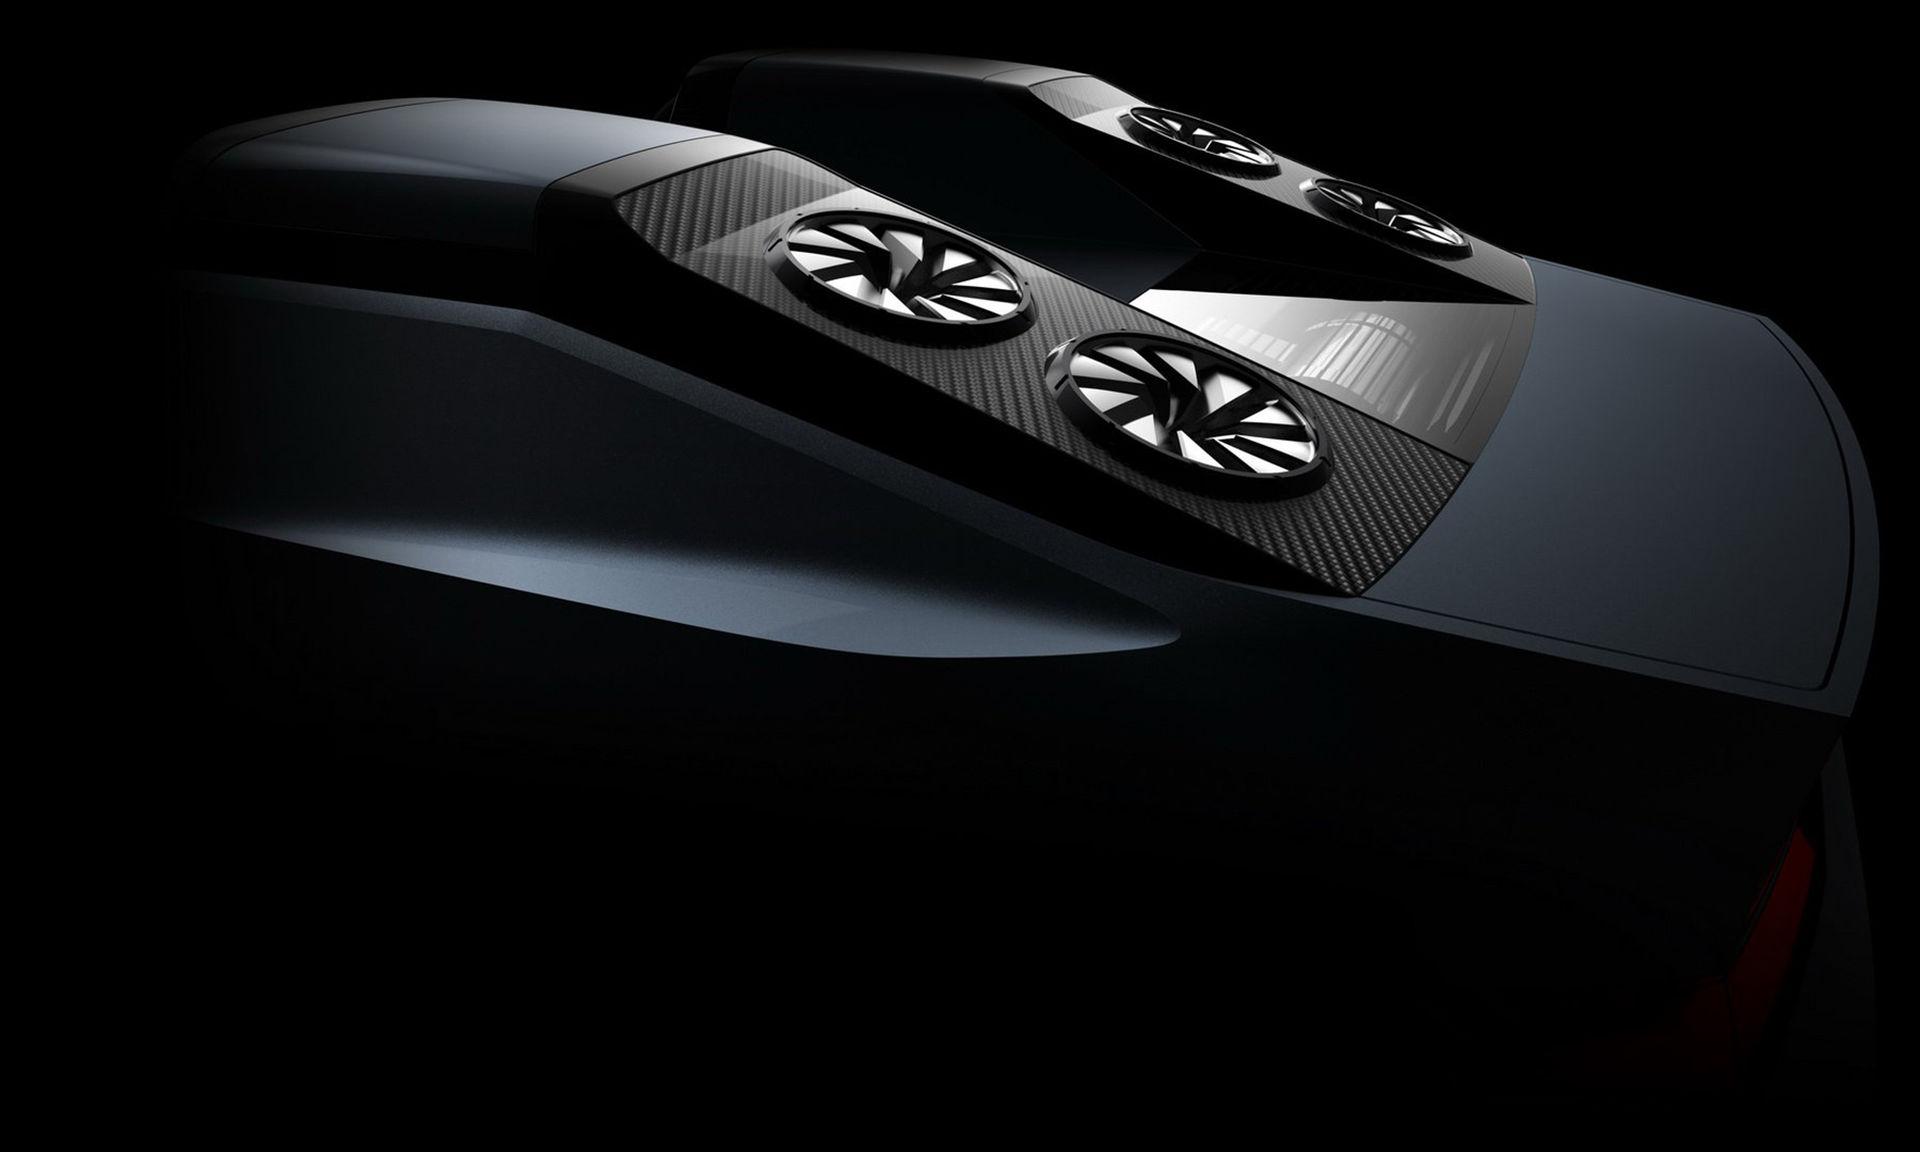 Mitsubishi teasar laddhybrid-koncept